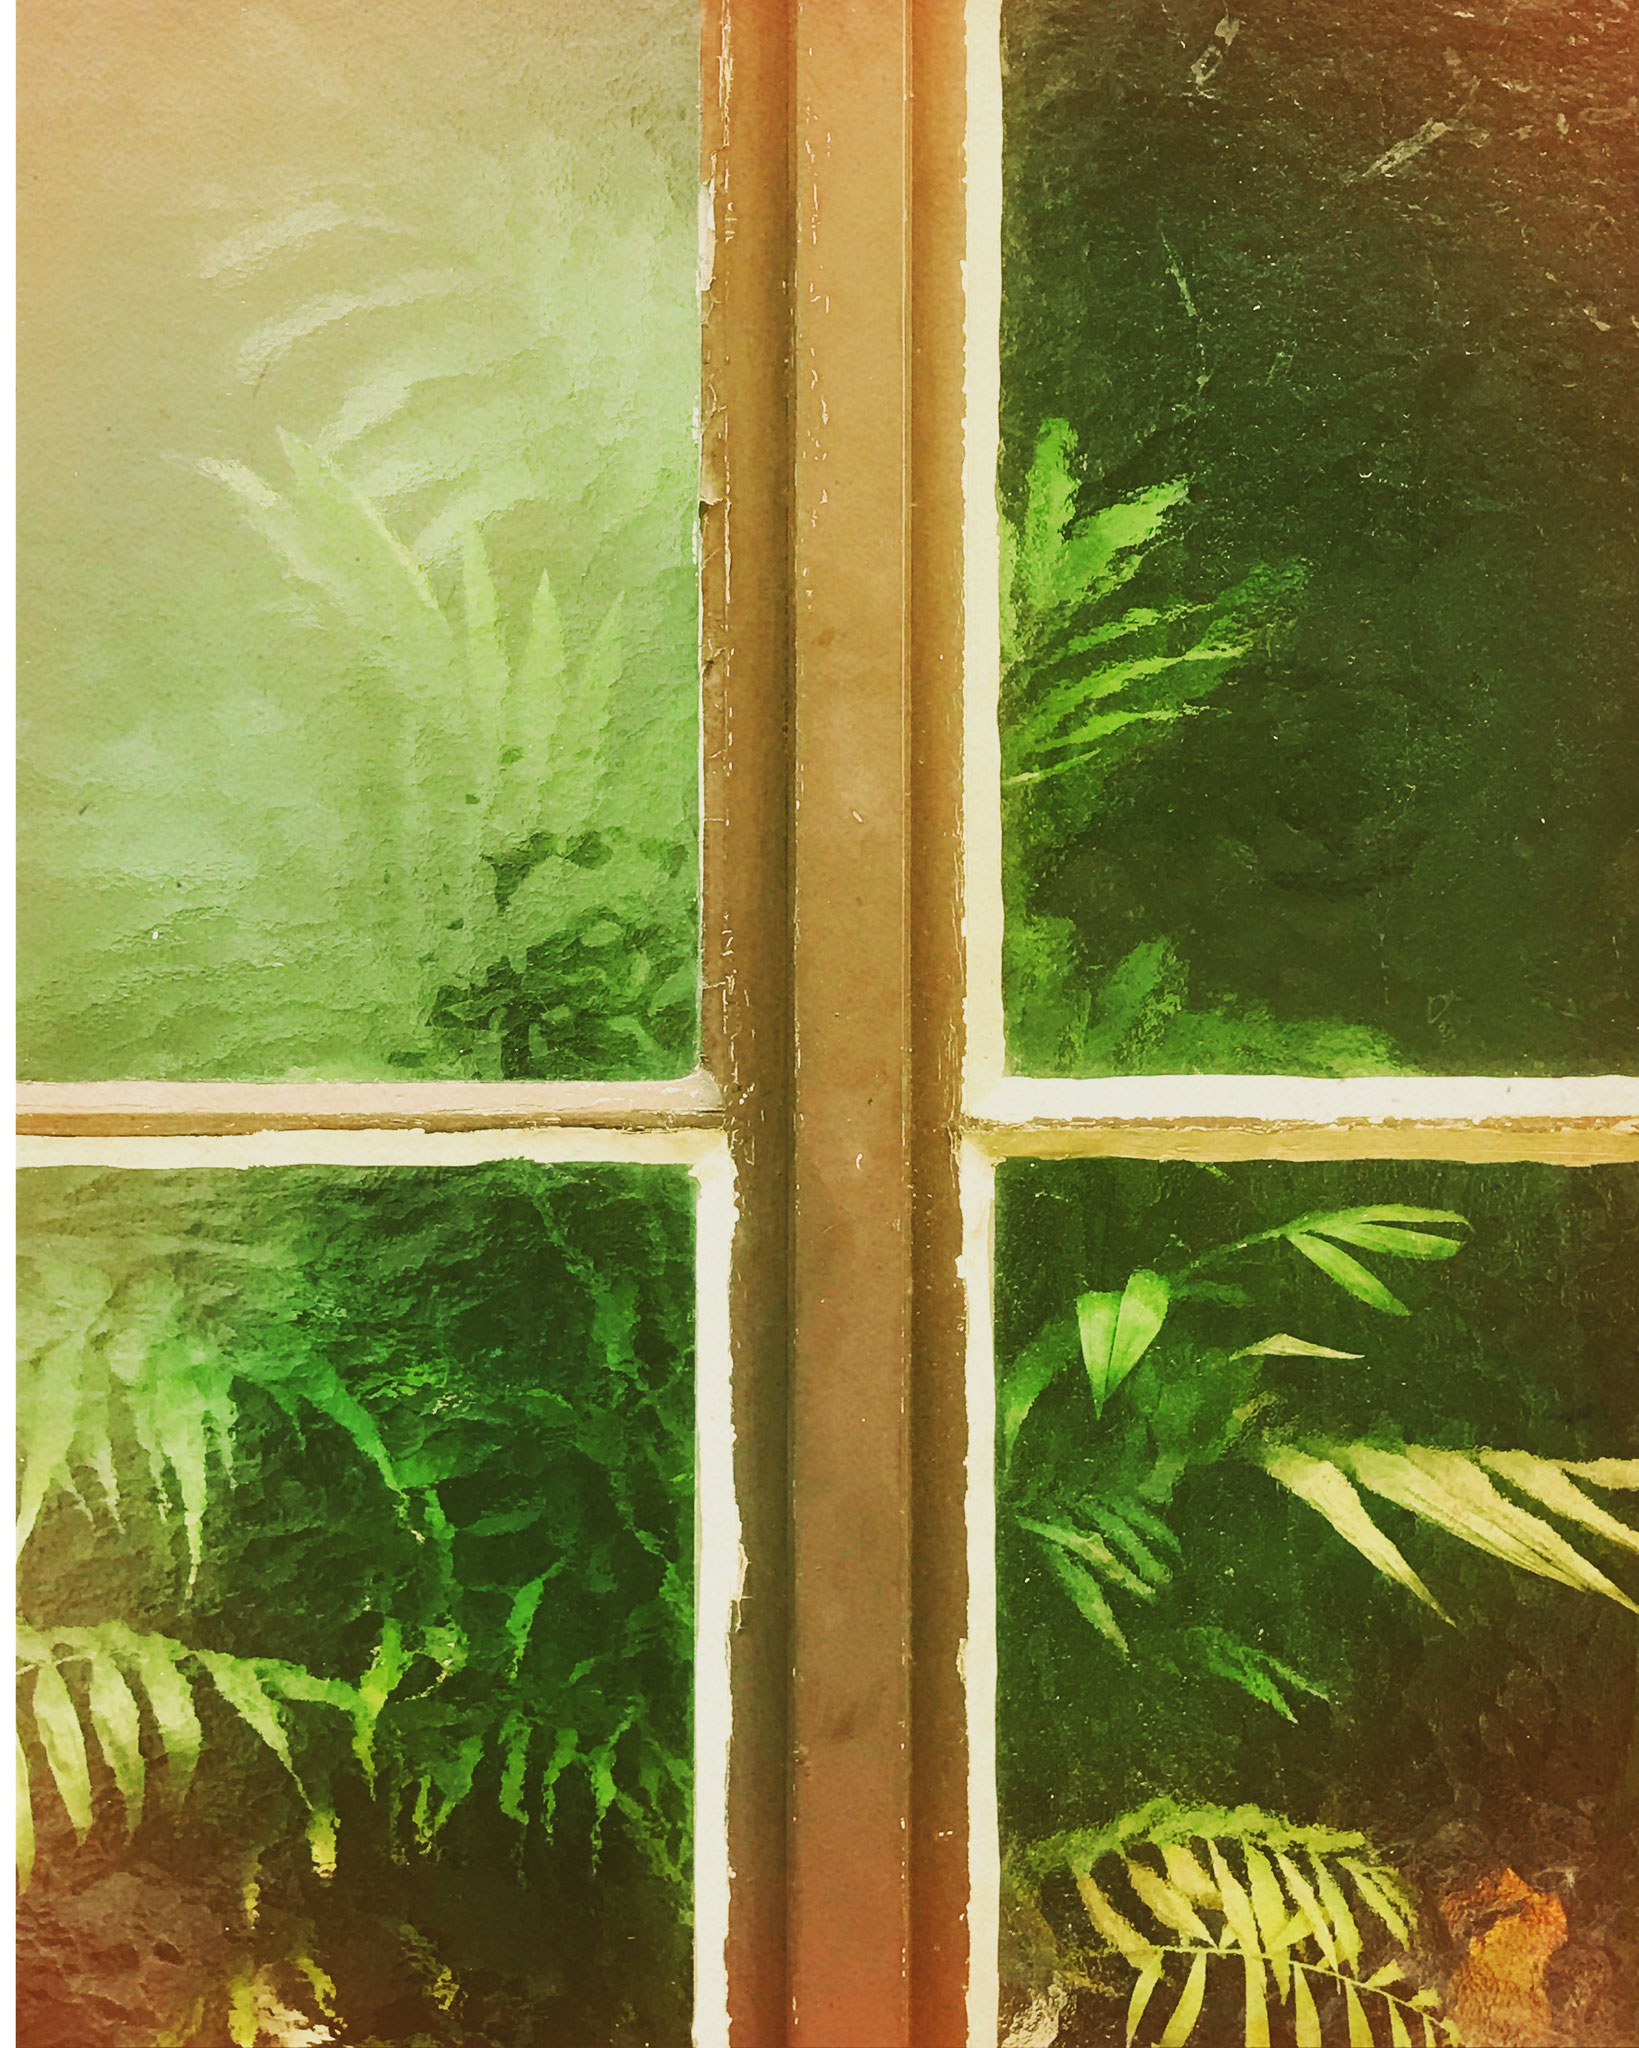 Urban Jungle behind a window